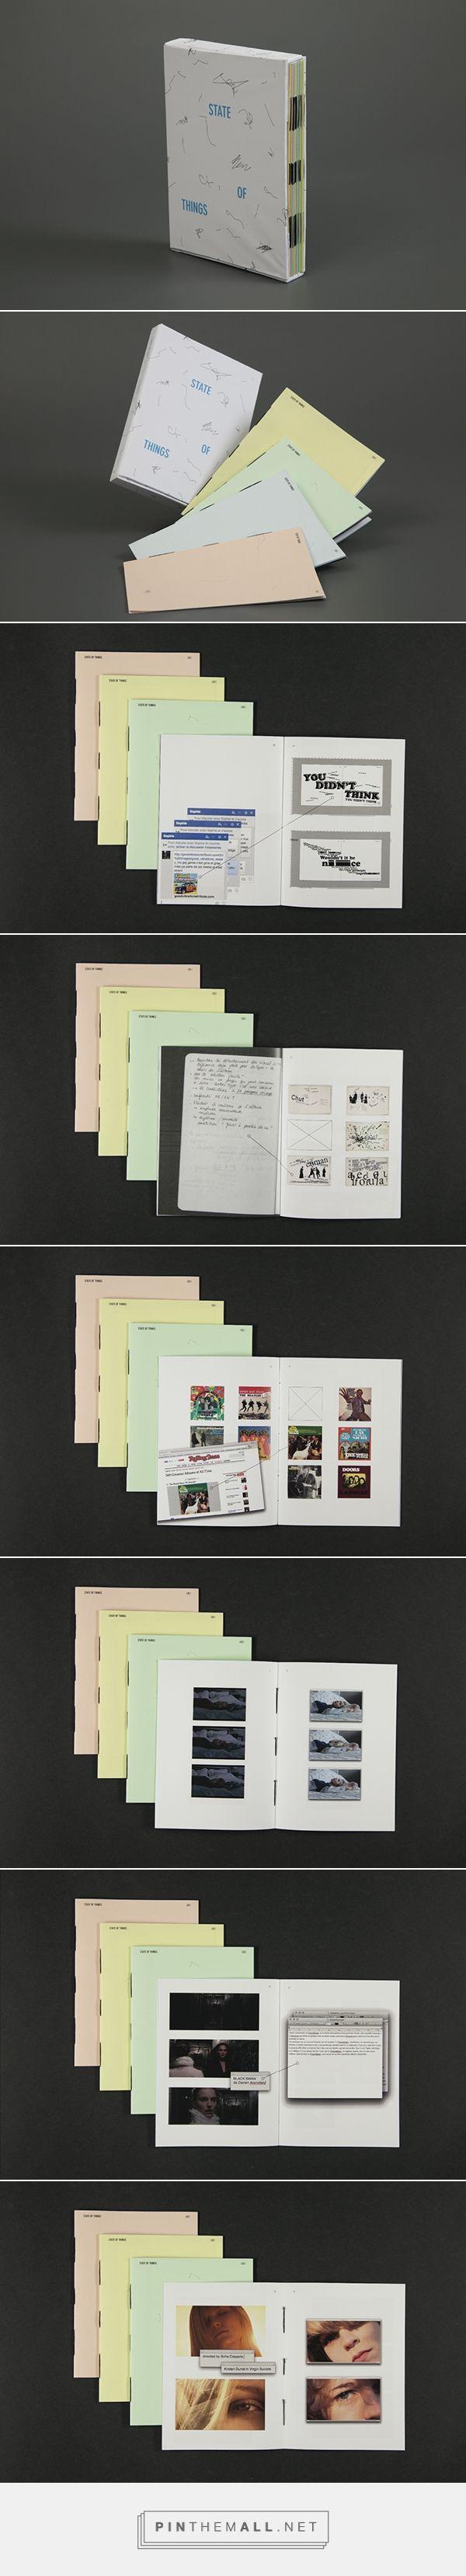 State of things - recueil de recherches d'un semestre - Elodie Loan (France)